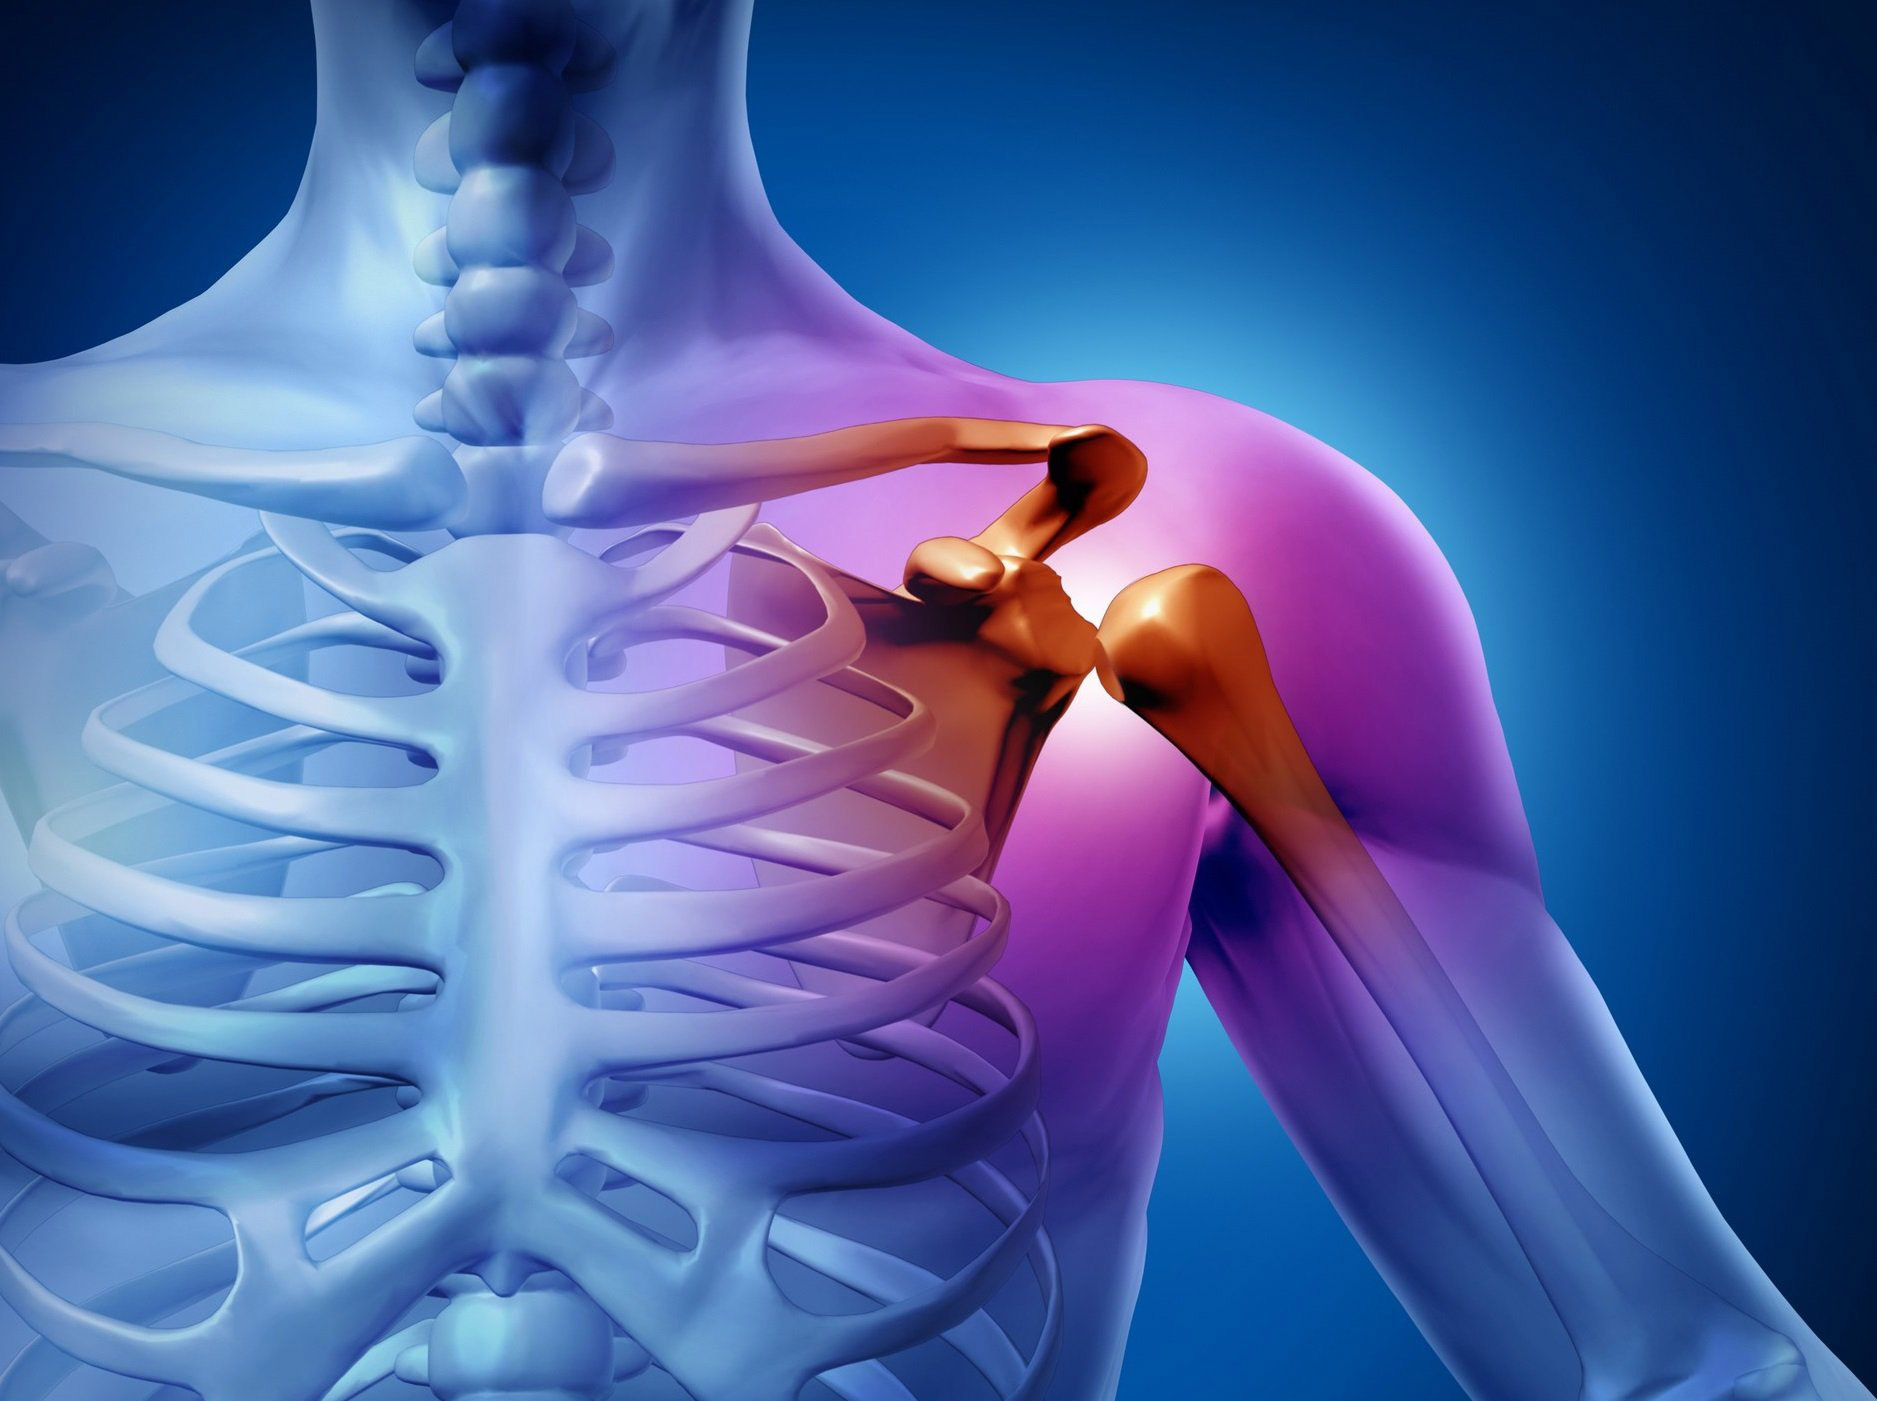 Бурсит плечевого сустава симптомы и лечение фото